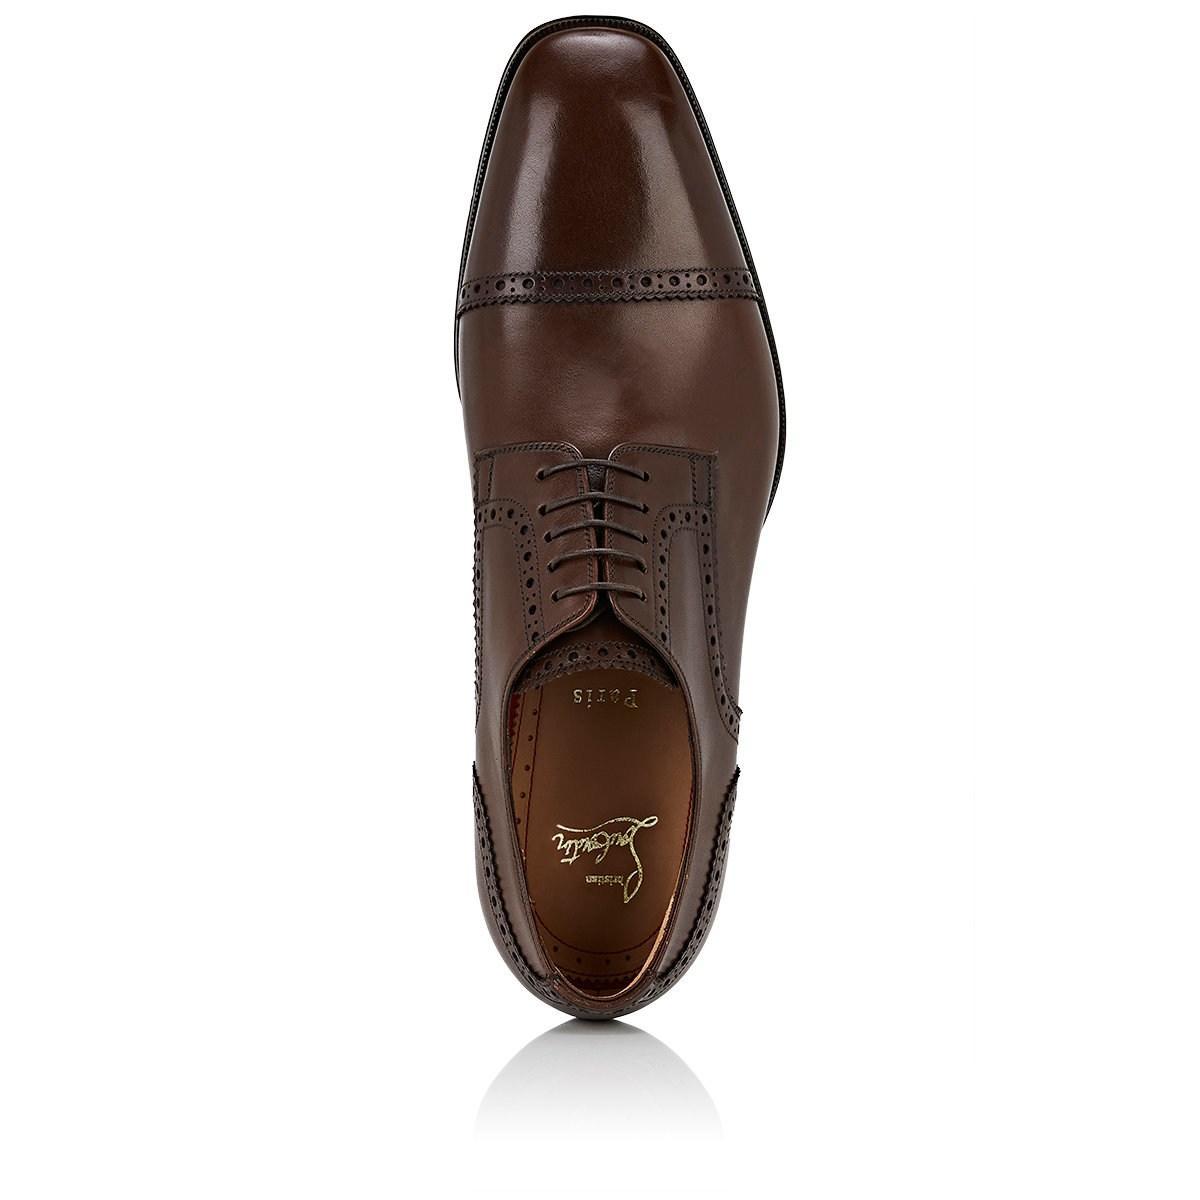 5e51346c757 Christian Louboutin - Brown Cousin Charles Flat Leather Bluchers for Men -  Lyst. View fullscreen